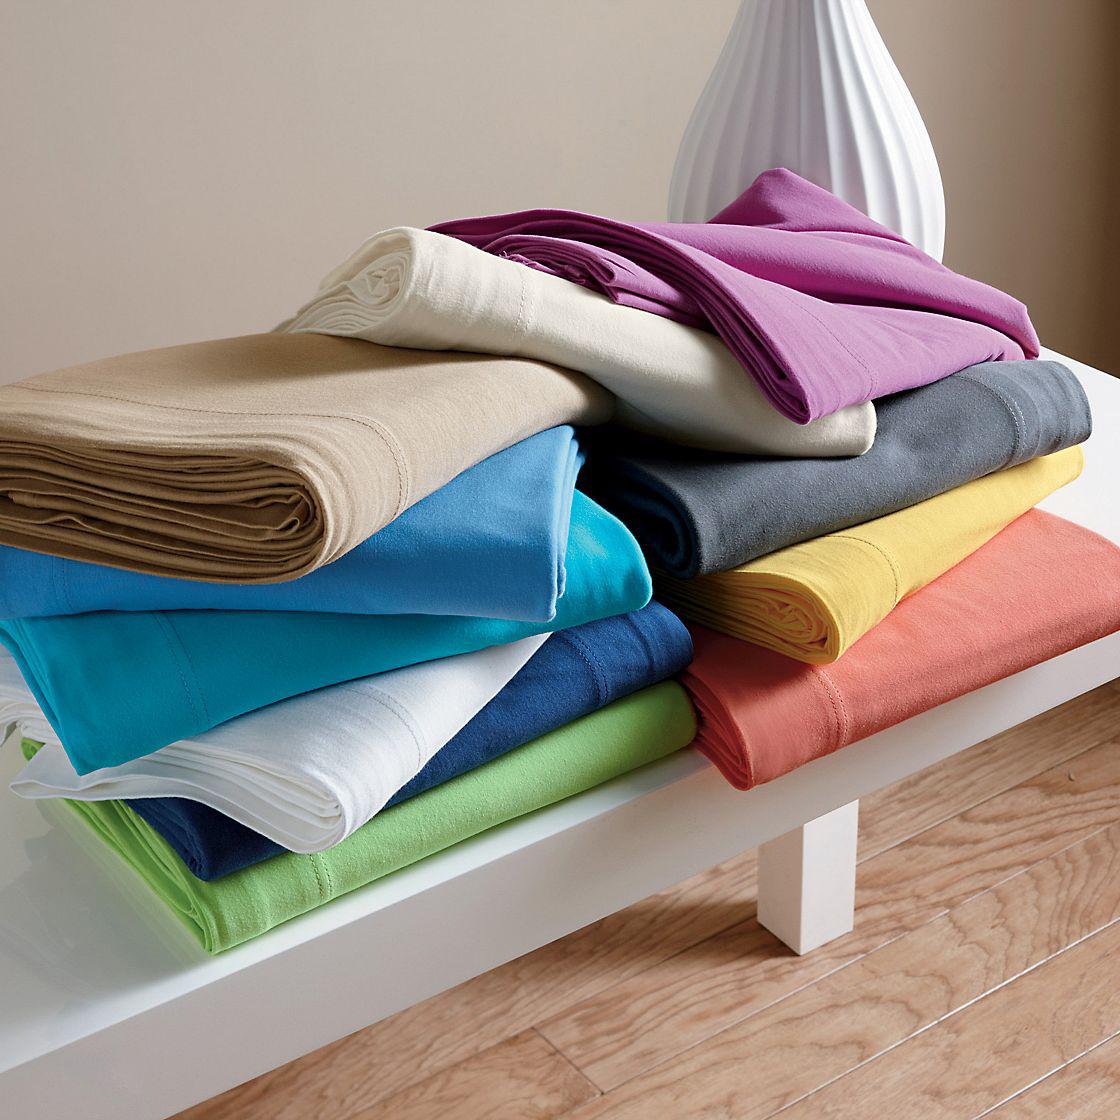 jersey knit sheets